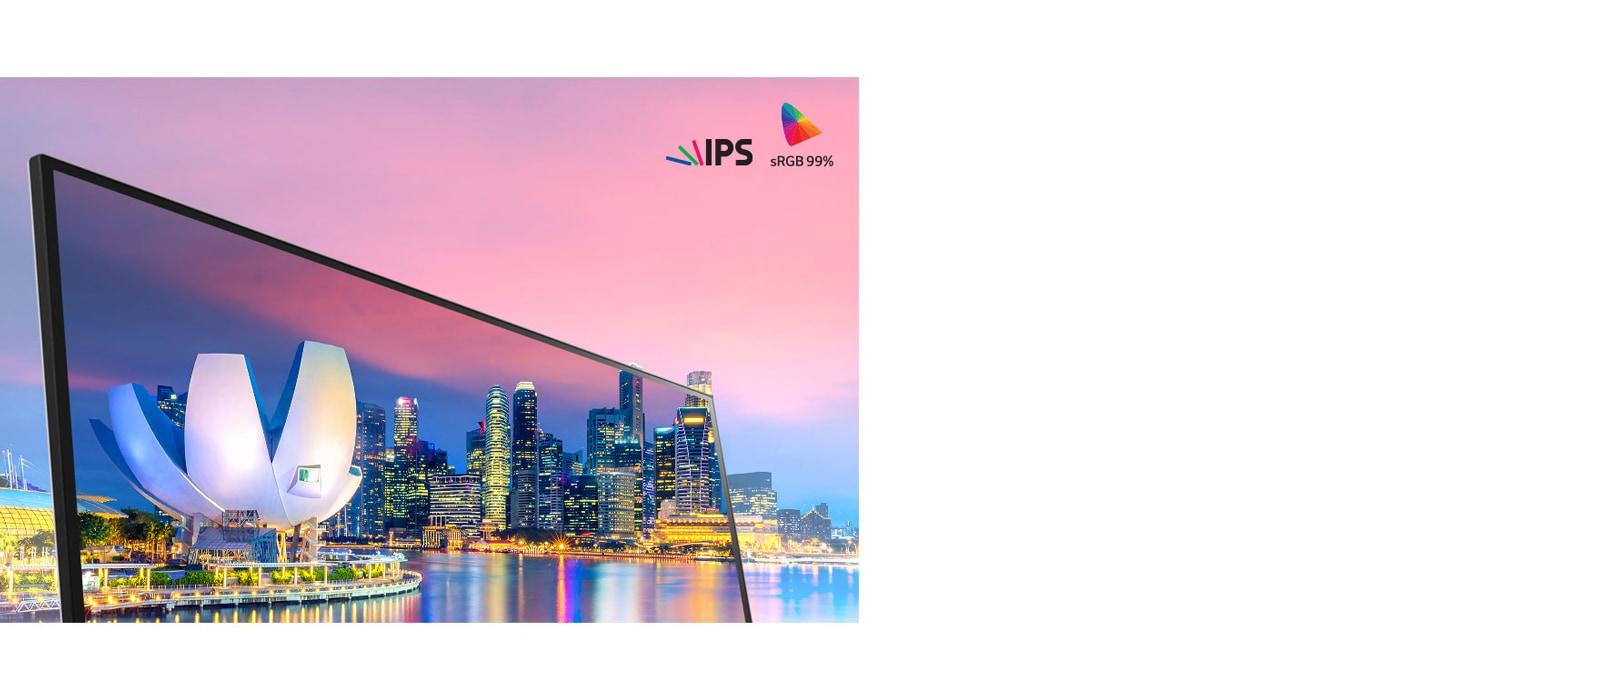 LG Monitors - IPS with sRGB 99%25